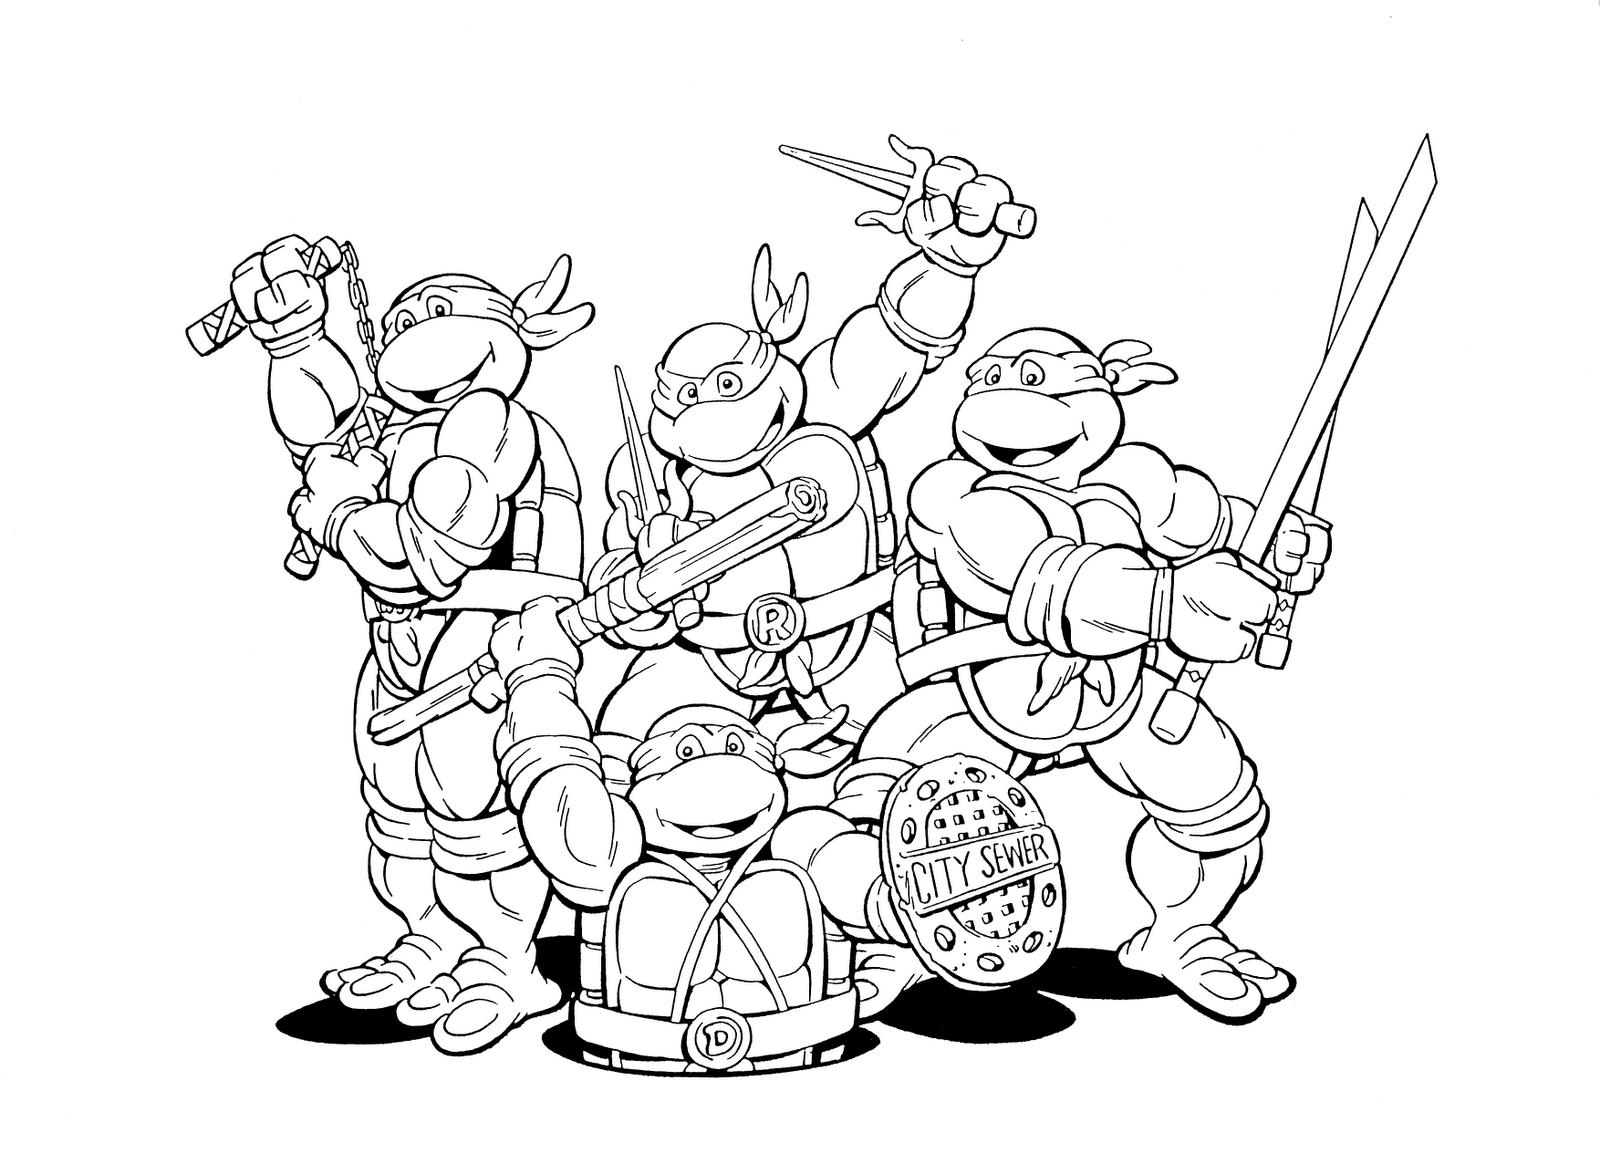 ninja turtle colouring page kleurplaat ninja turtles masker krijg duizenden turtle page ninja colouring